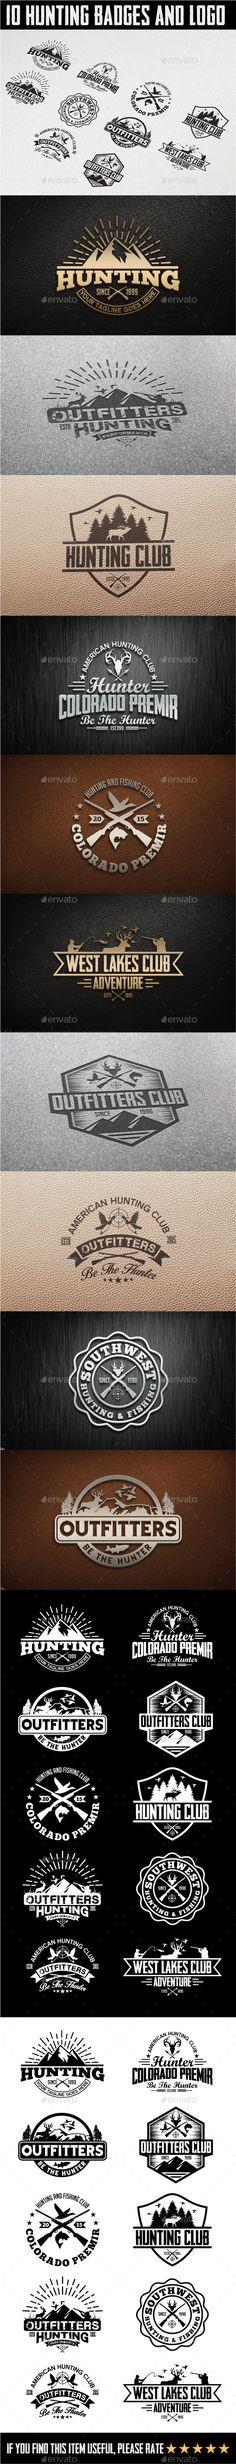 10 Hunting Vintage Badges and Logos #logos #badges Download: http://graphicriver.net/item/10-hunting-vintage-badges-and-logos/11560070?ref=ksioks